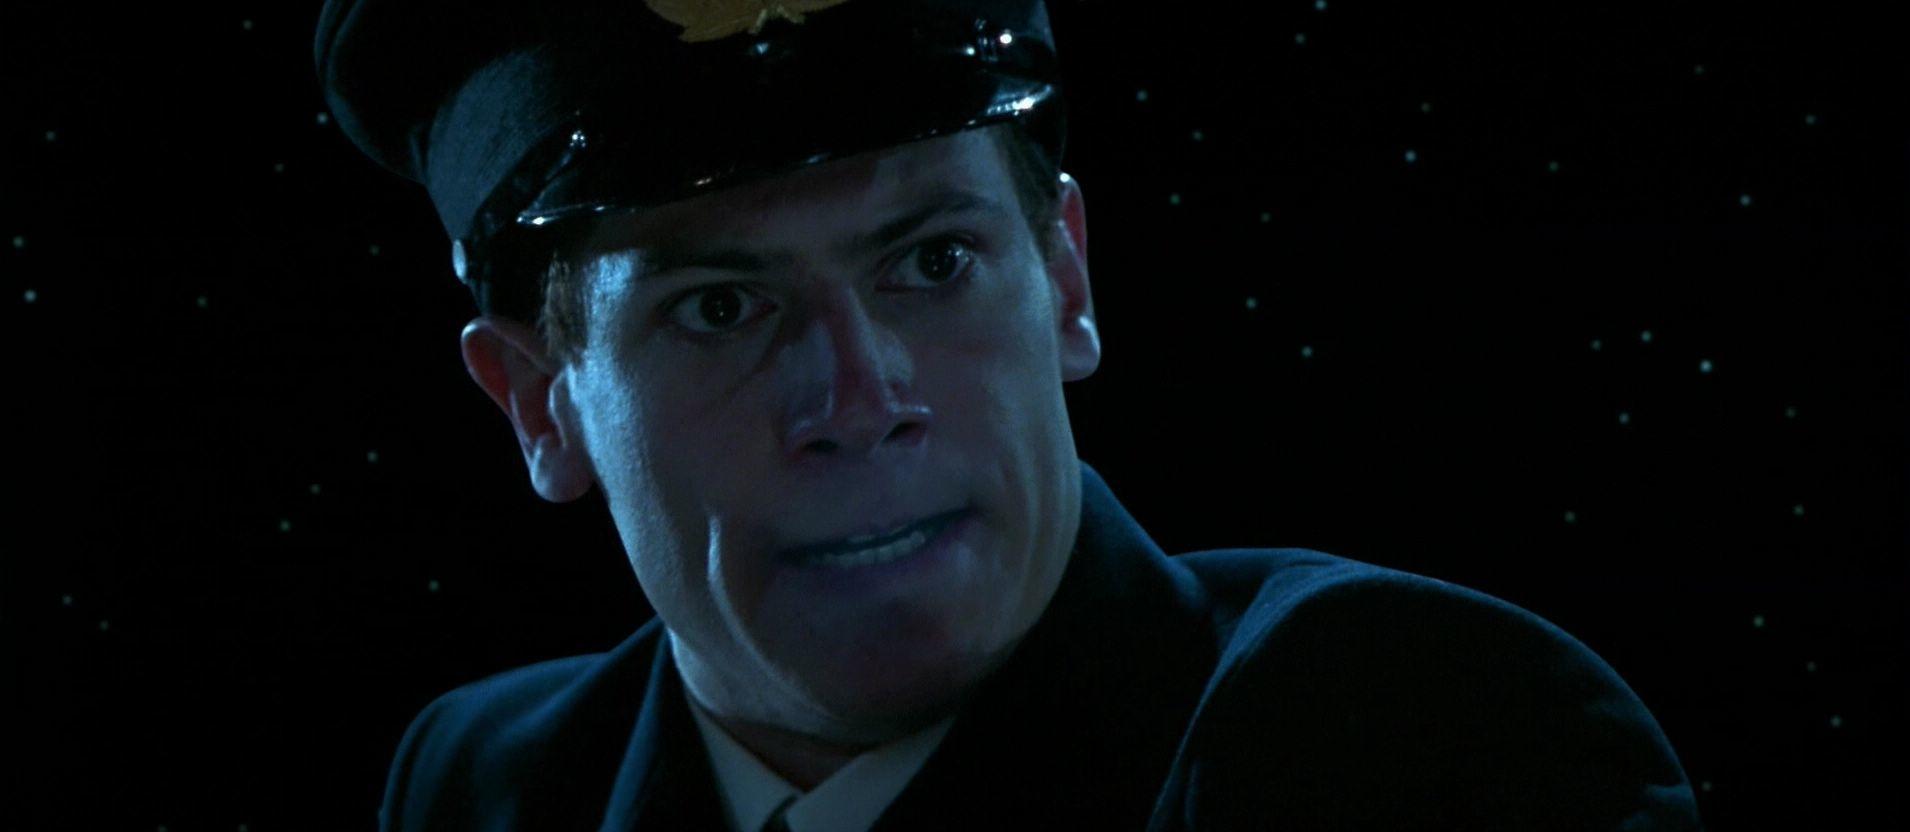 Titanic-ioan-gruffudd- Ioan Gruffudd In Titanic